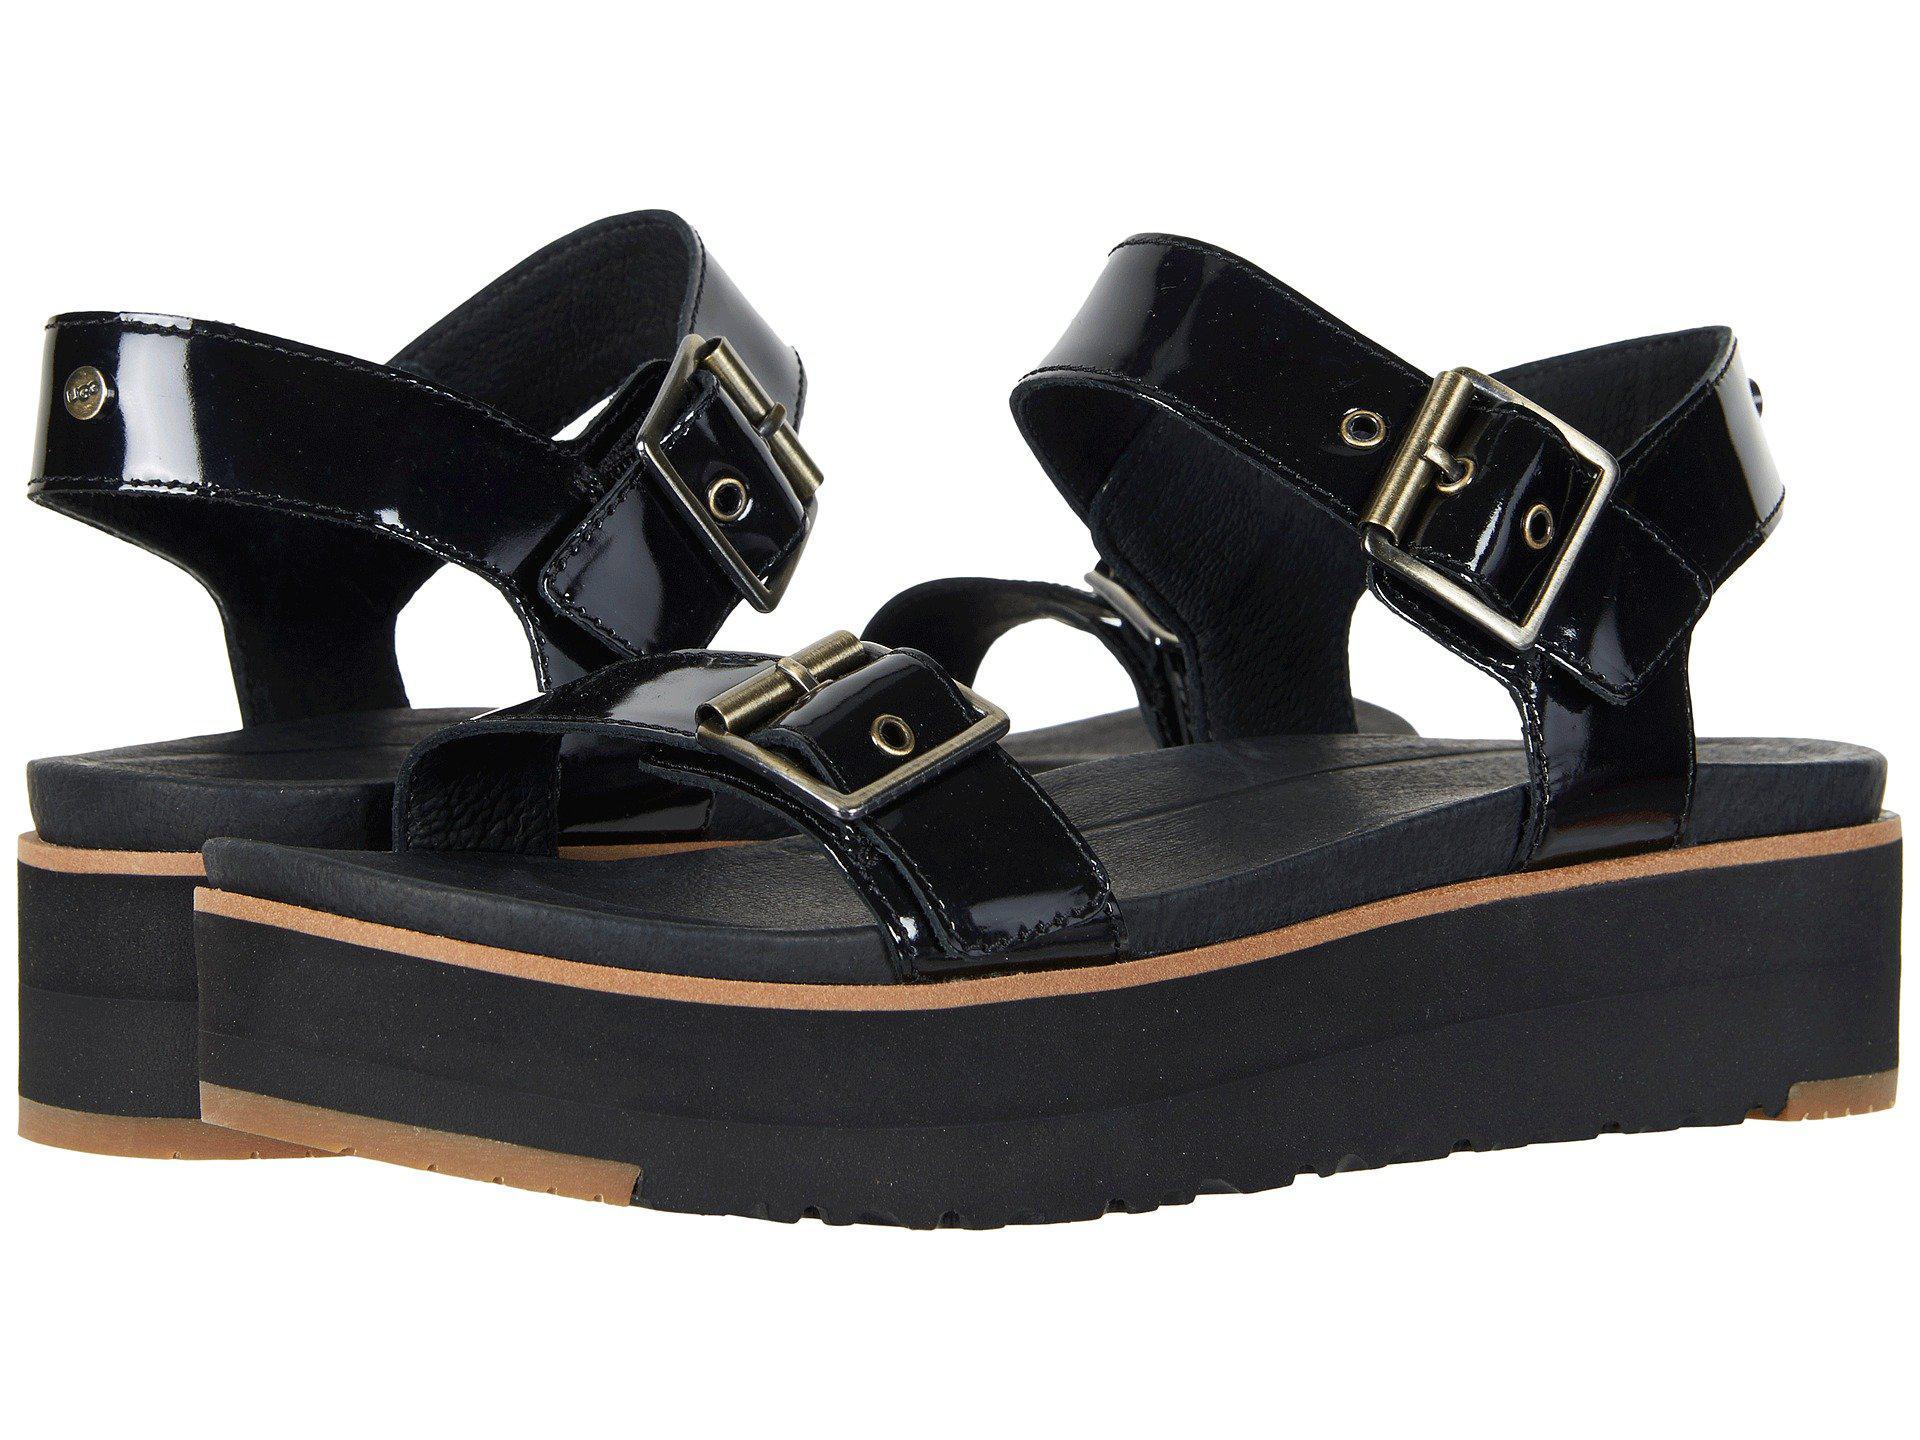 c822e789bb0 Ugg Angie (black) Women's Sandals